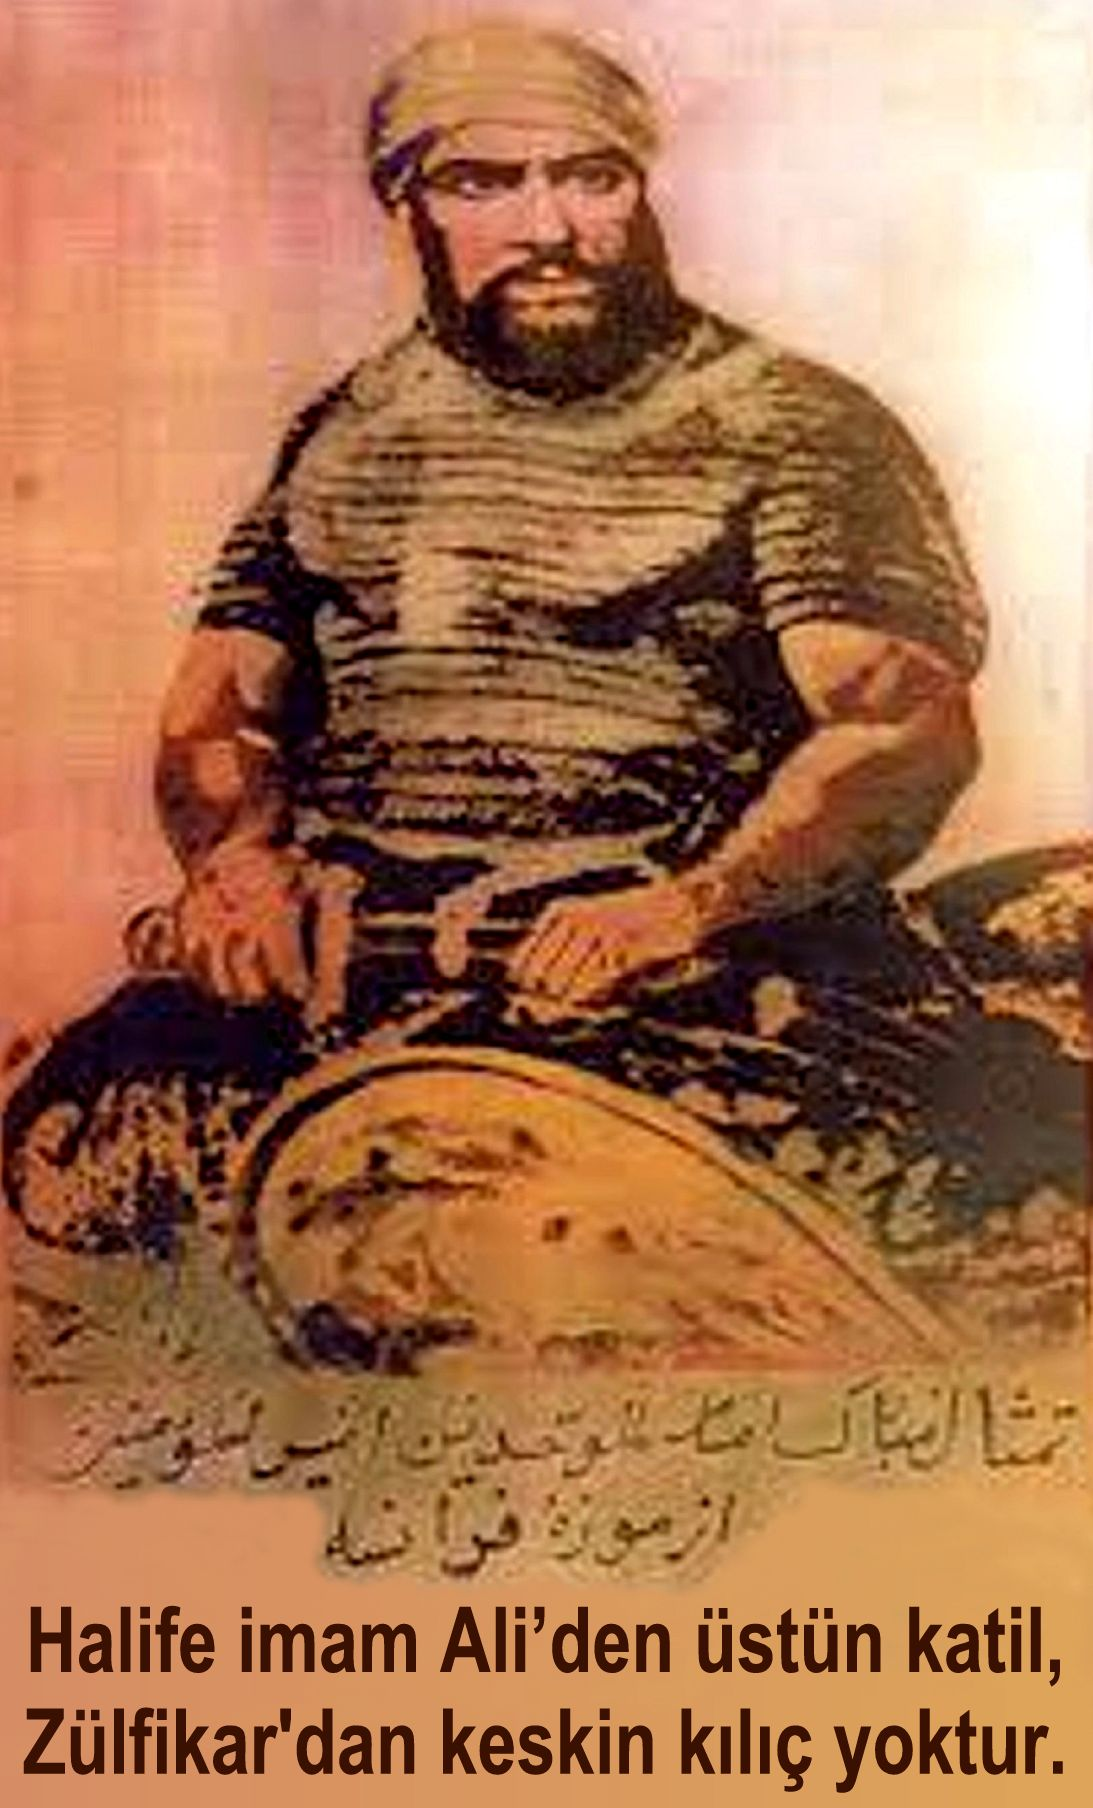 1 Hz imam Ali divani Alevi bektasi kizilbas pir sultan devrimci aleviler birligi DAB Feramuz Sah Acar arap hz ali keskin kilic yok